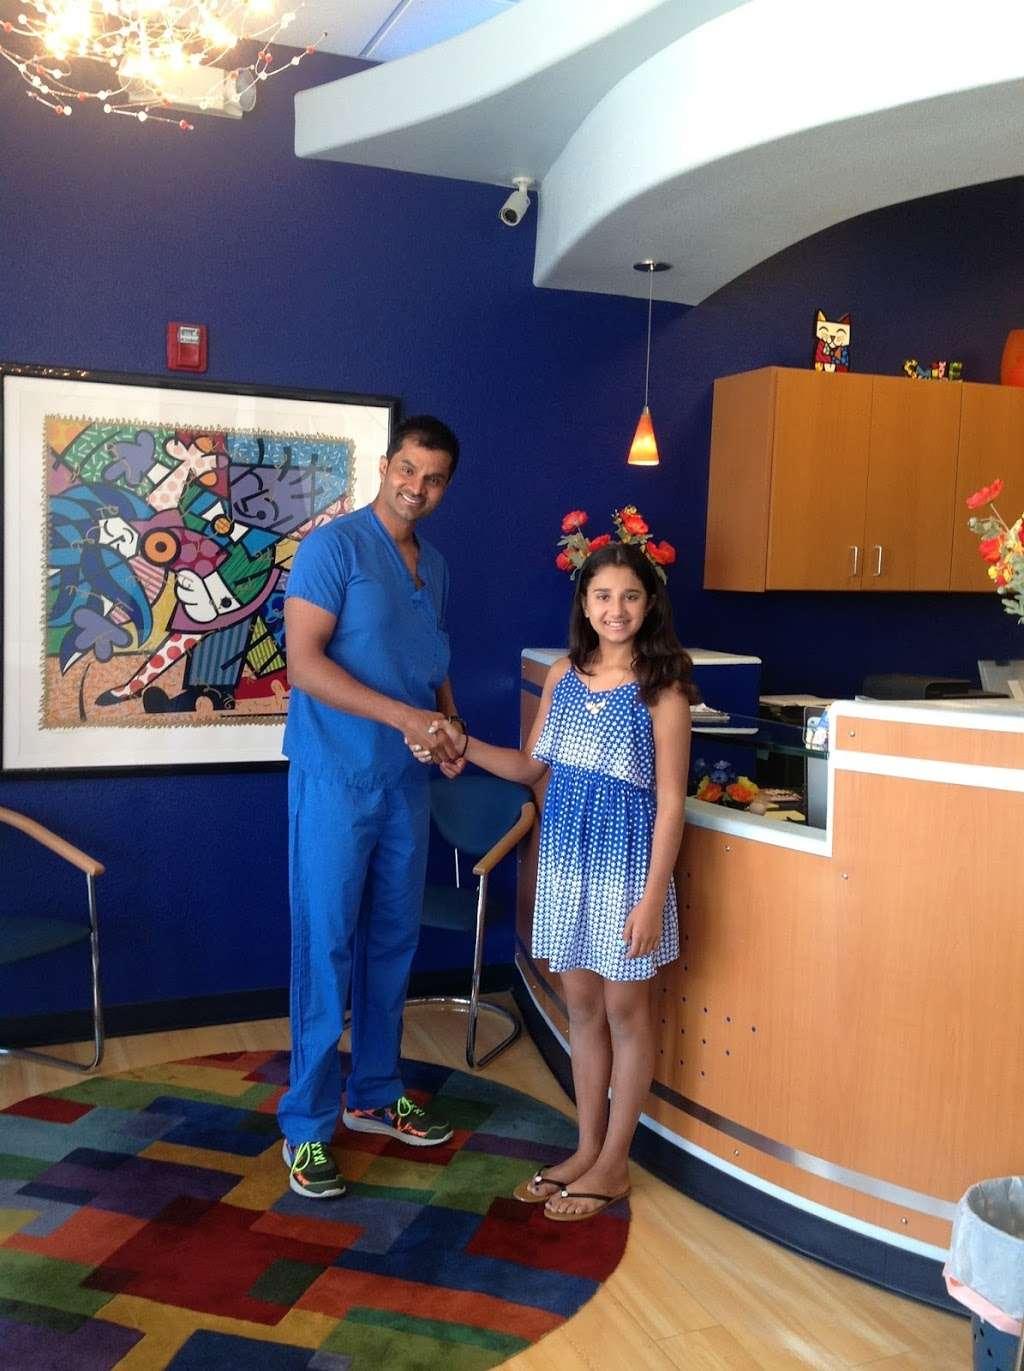 Your Family Dentist, PC. Yati Yadav DDS - dentist    Photo 2 of 10   Address: 8390 W Cactus Rd # 110, Peoria, AZ 85381, USA   Phone: (623) 878-3300